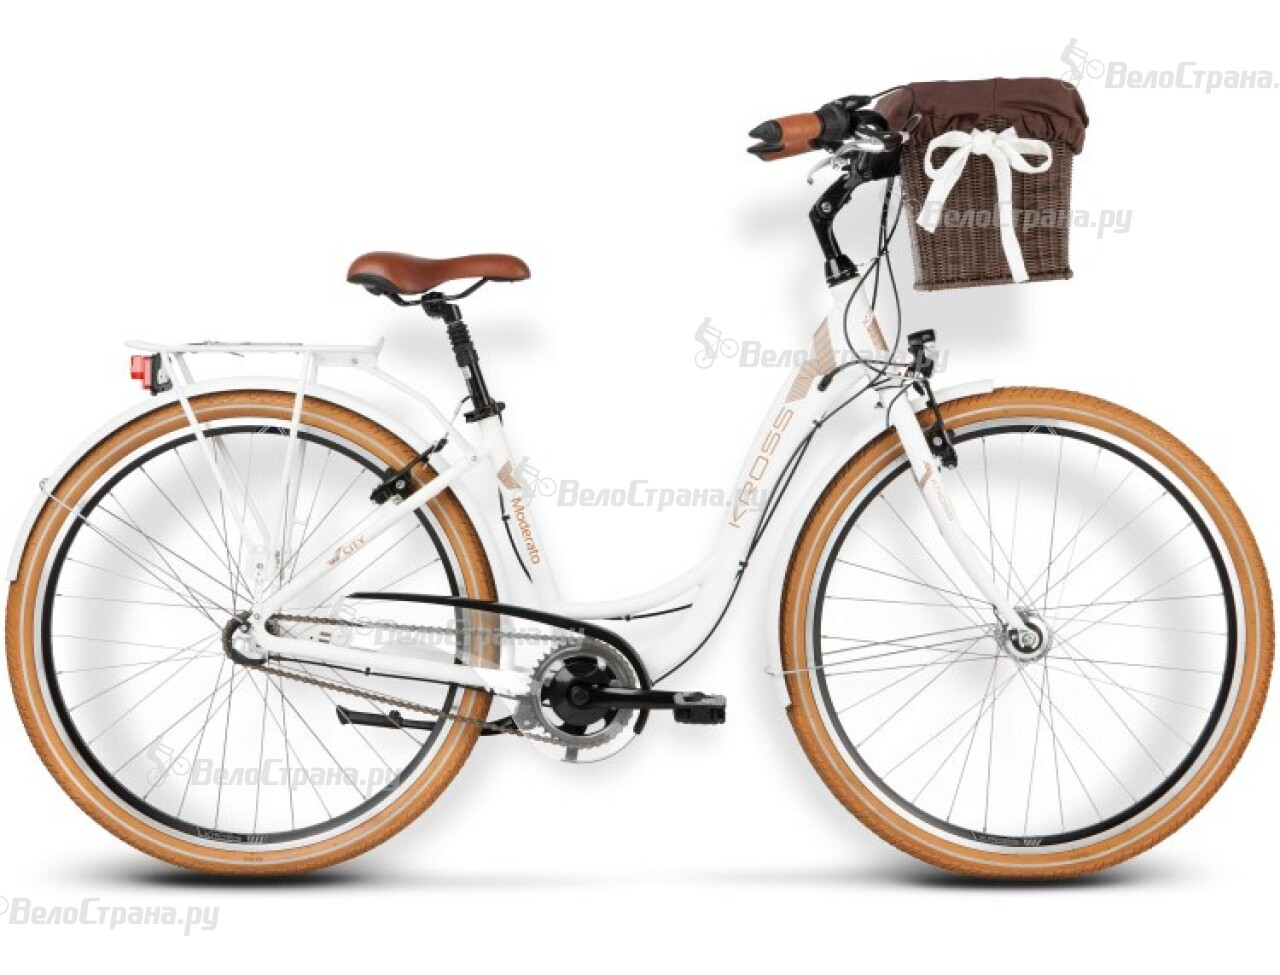 купить Велосипед Kross Moderato (2015) недорого